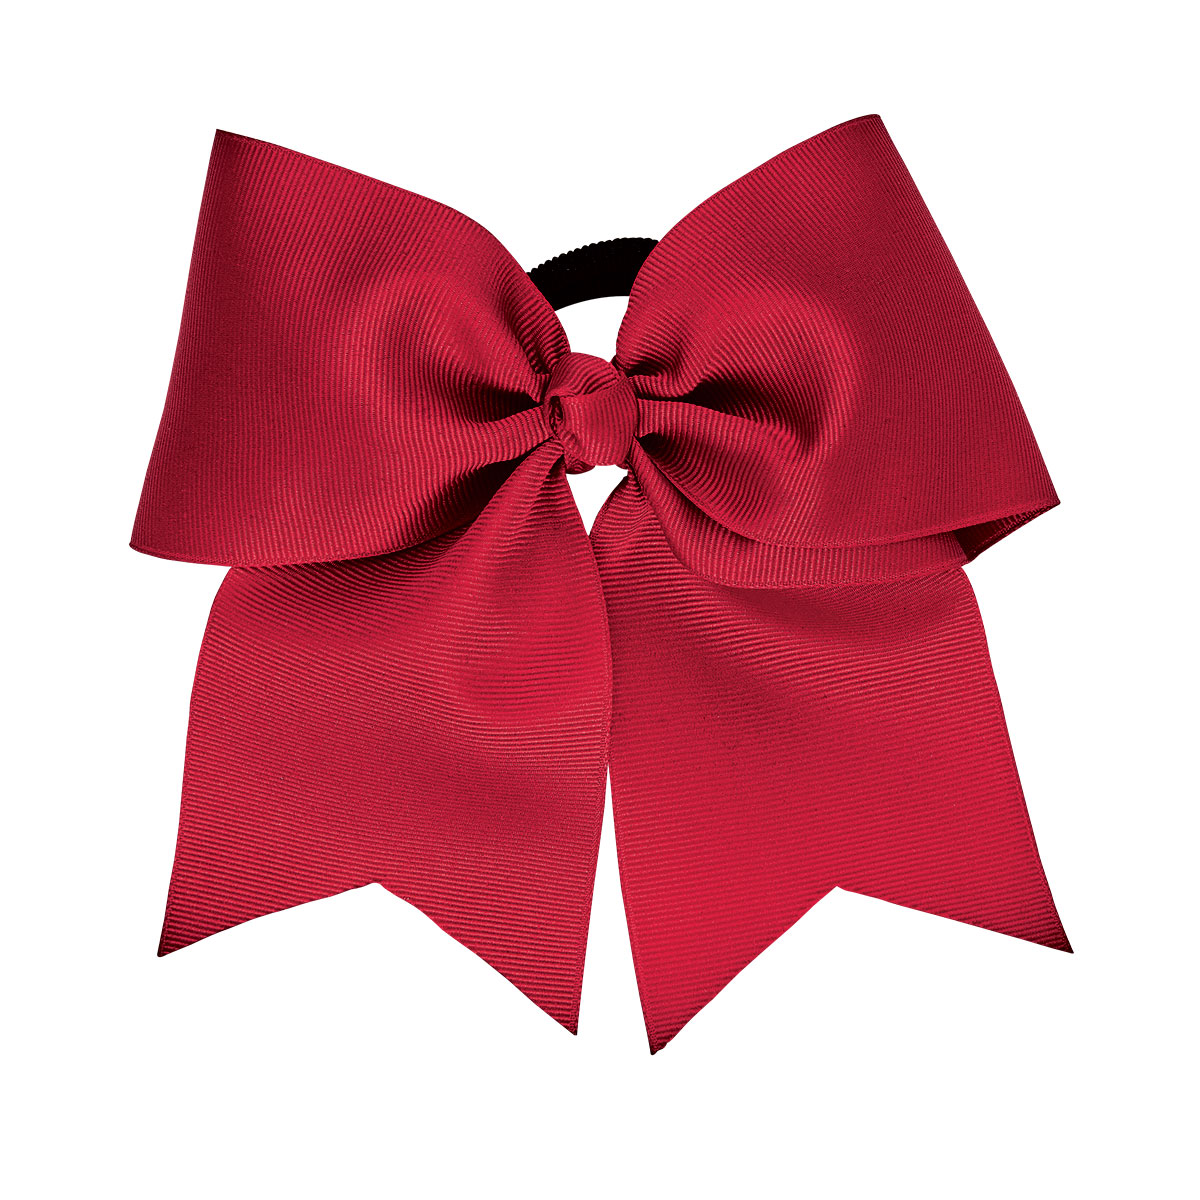 cheerleading bows cheer bows hair accessories for cheerleaders